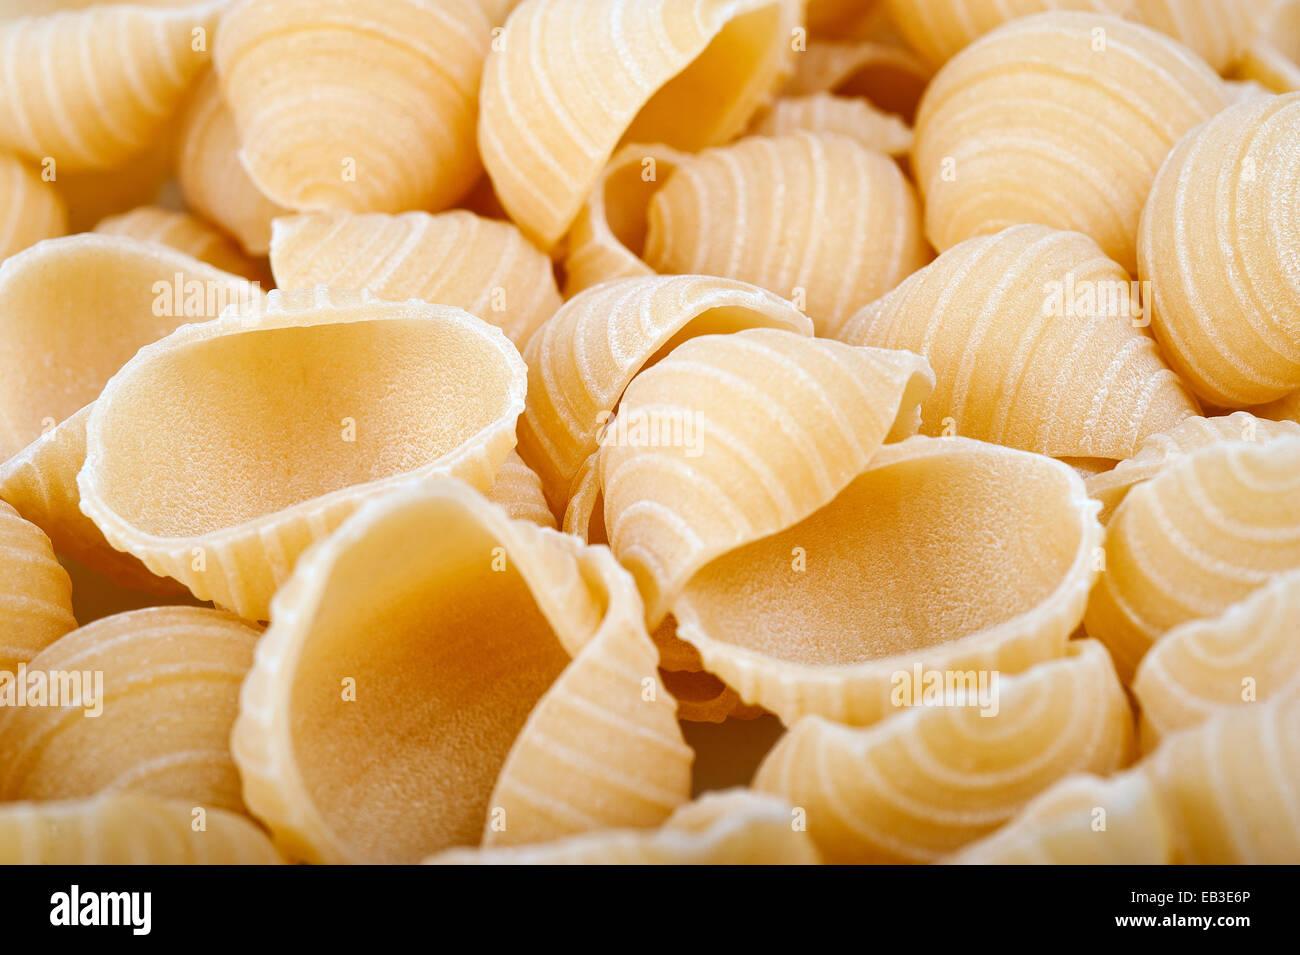 Group of conchiglie italian pasta - Stock Image